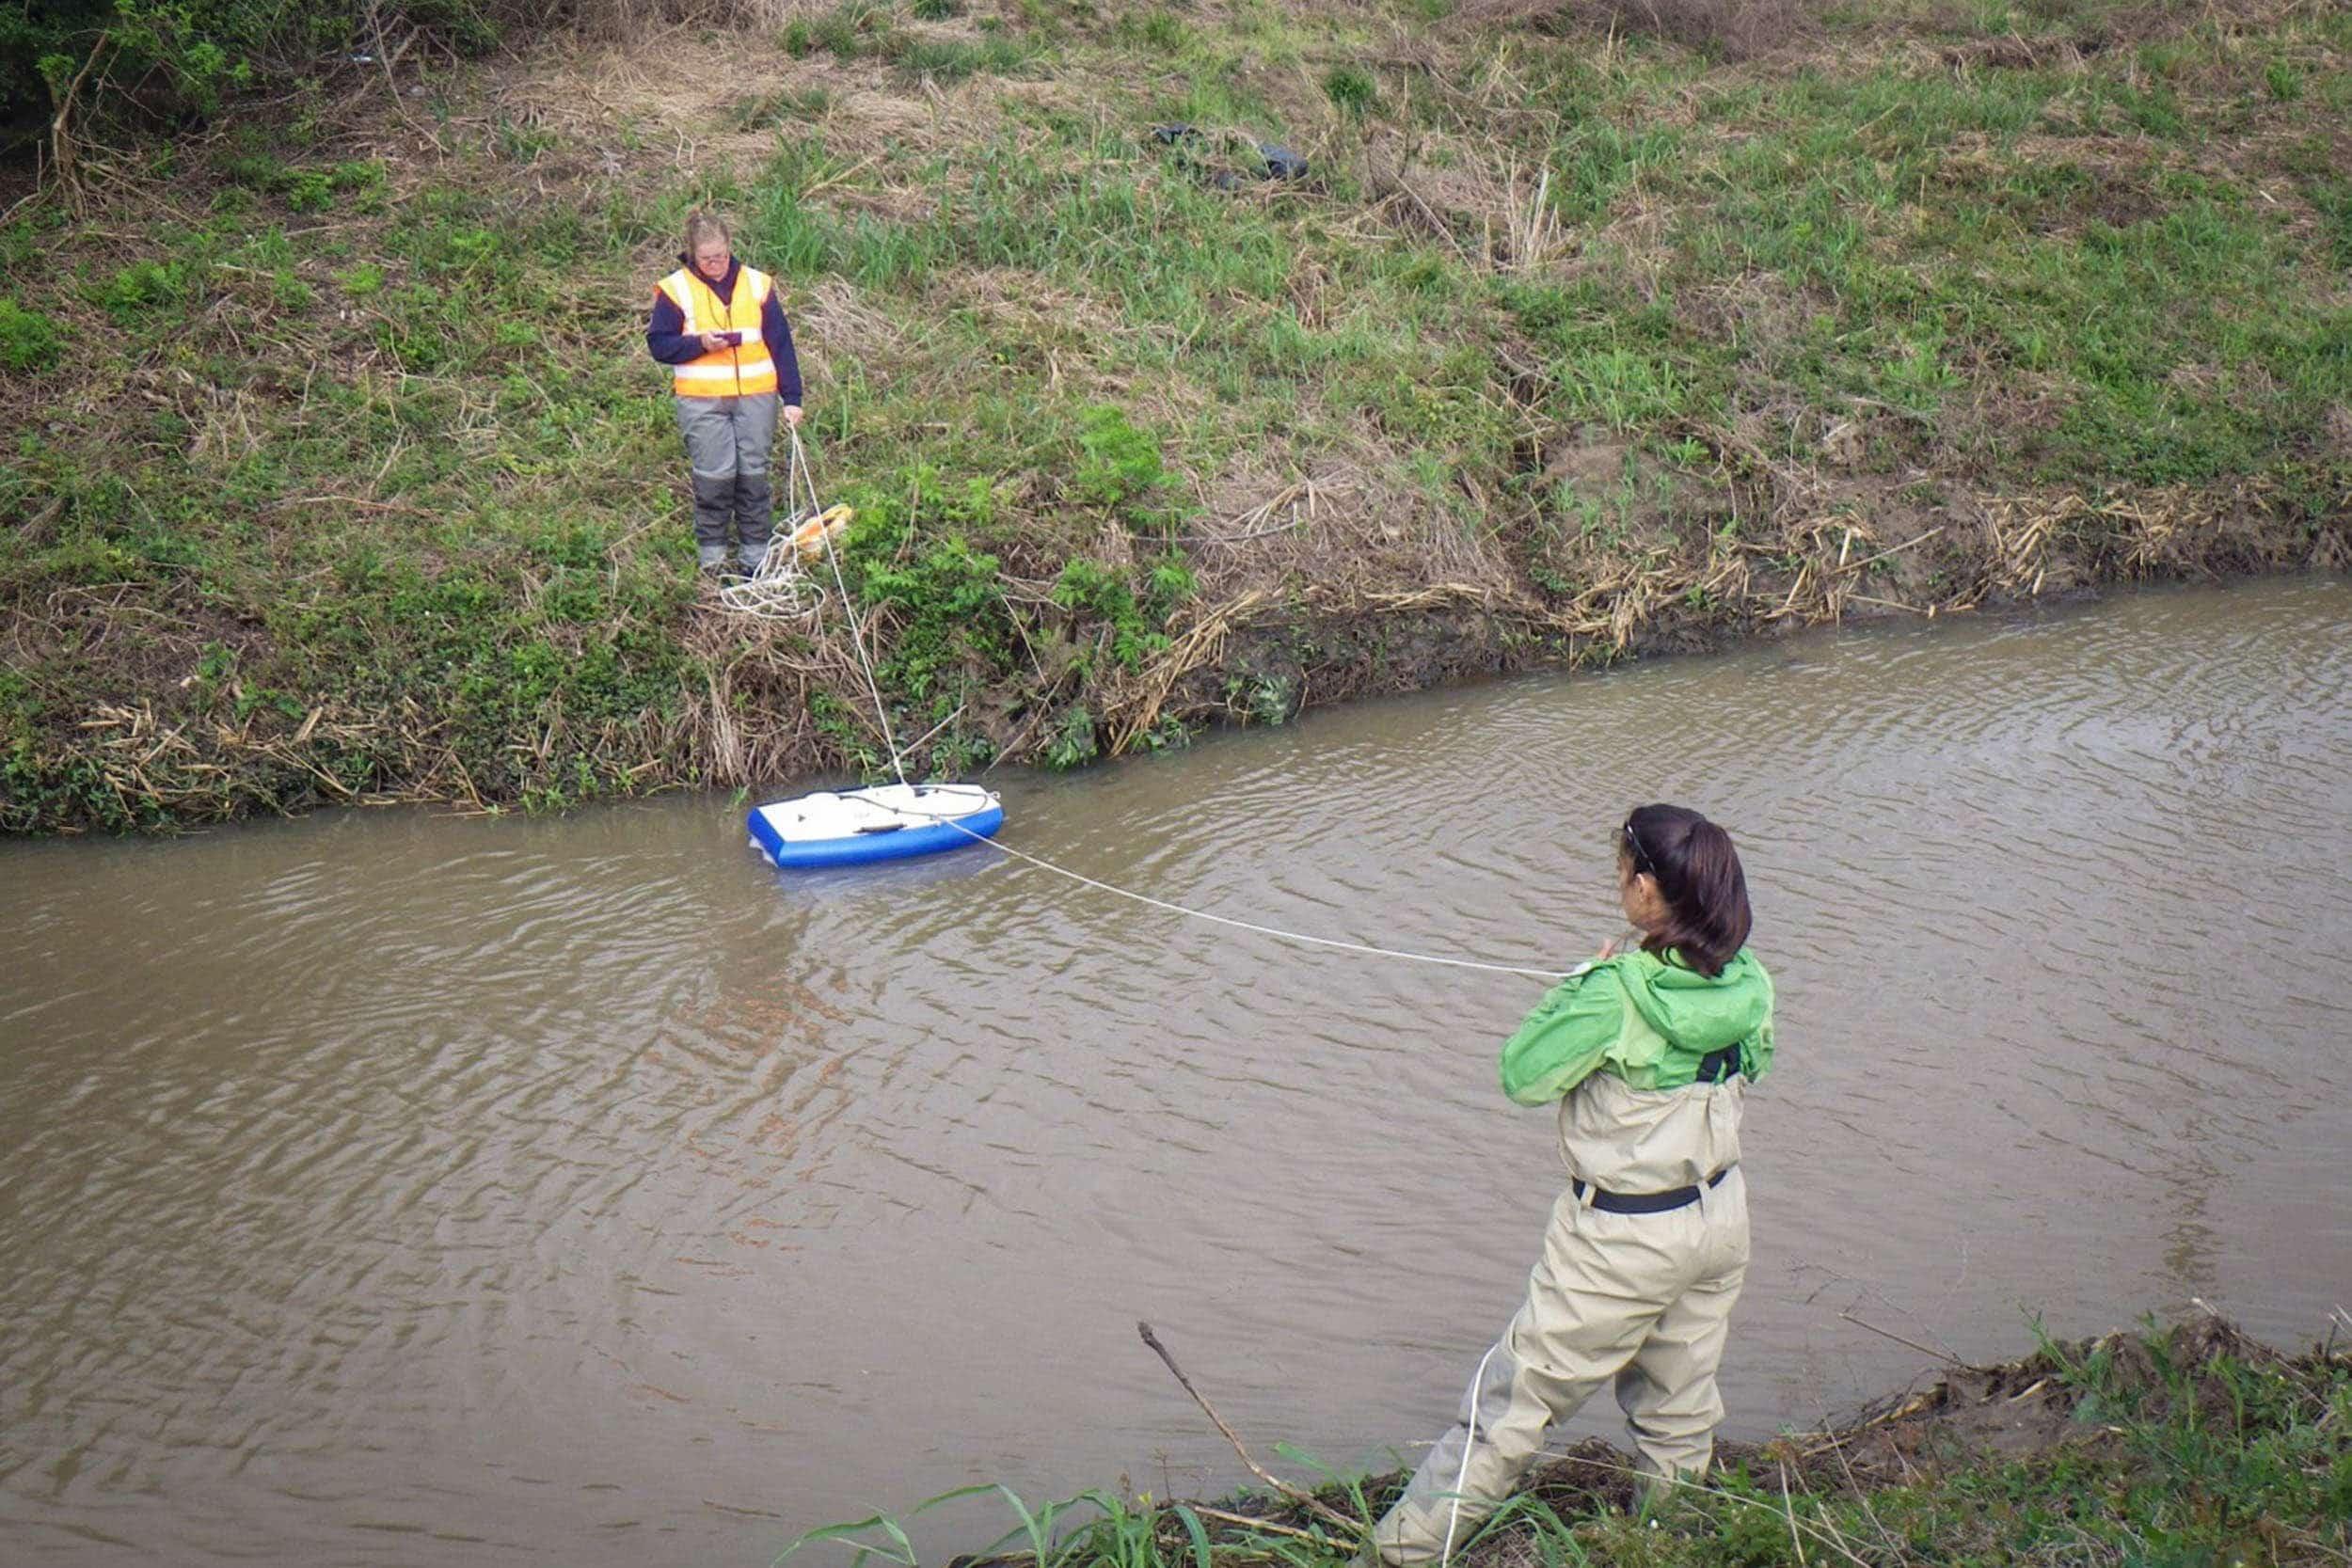 Natasha Zarnstorff and Kristi Fazioli use the SonTek flow boat to take flow measurements.